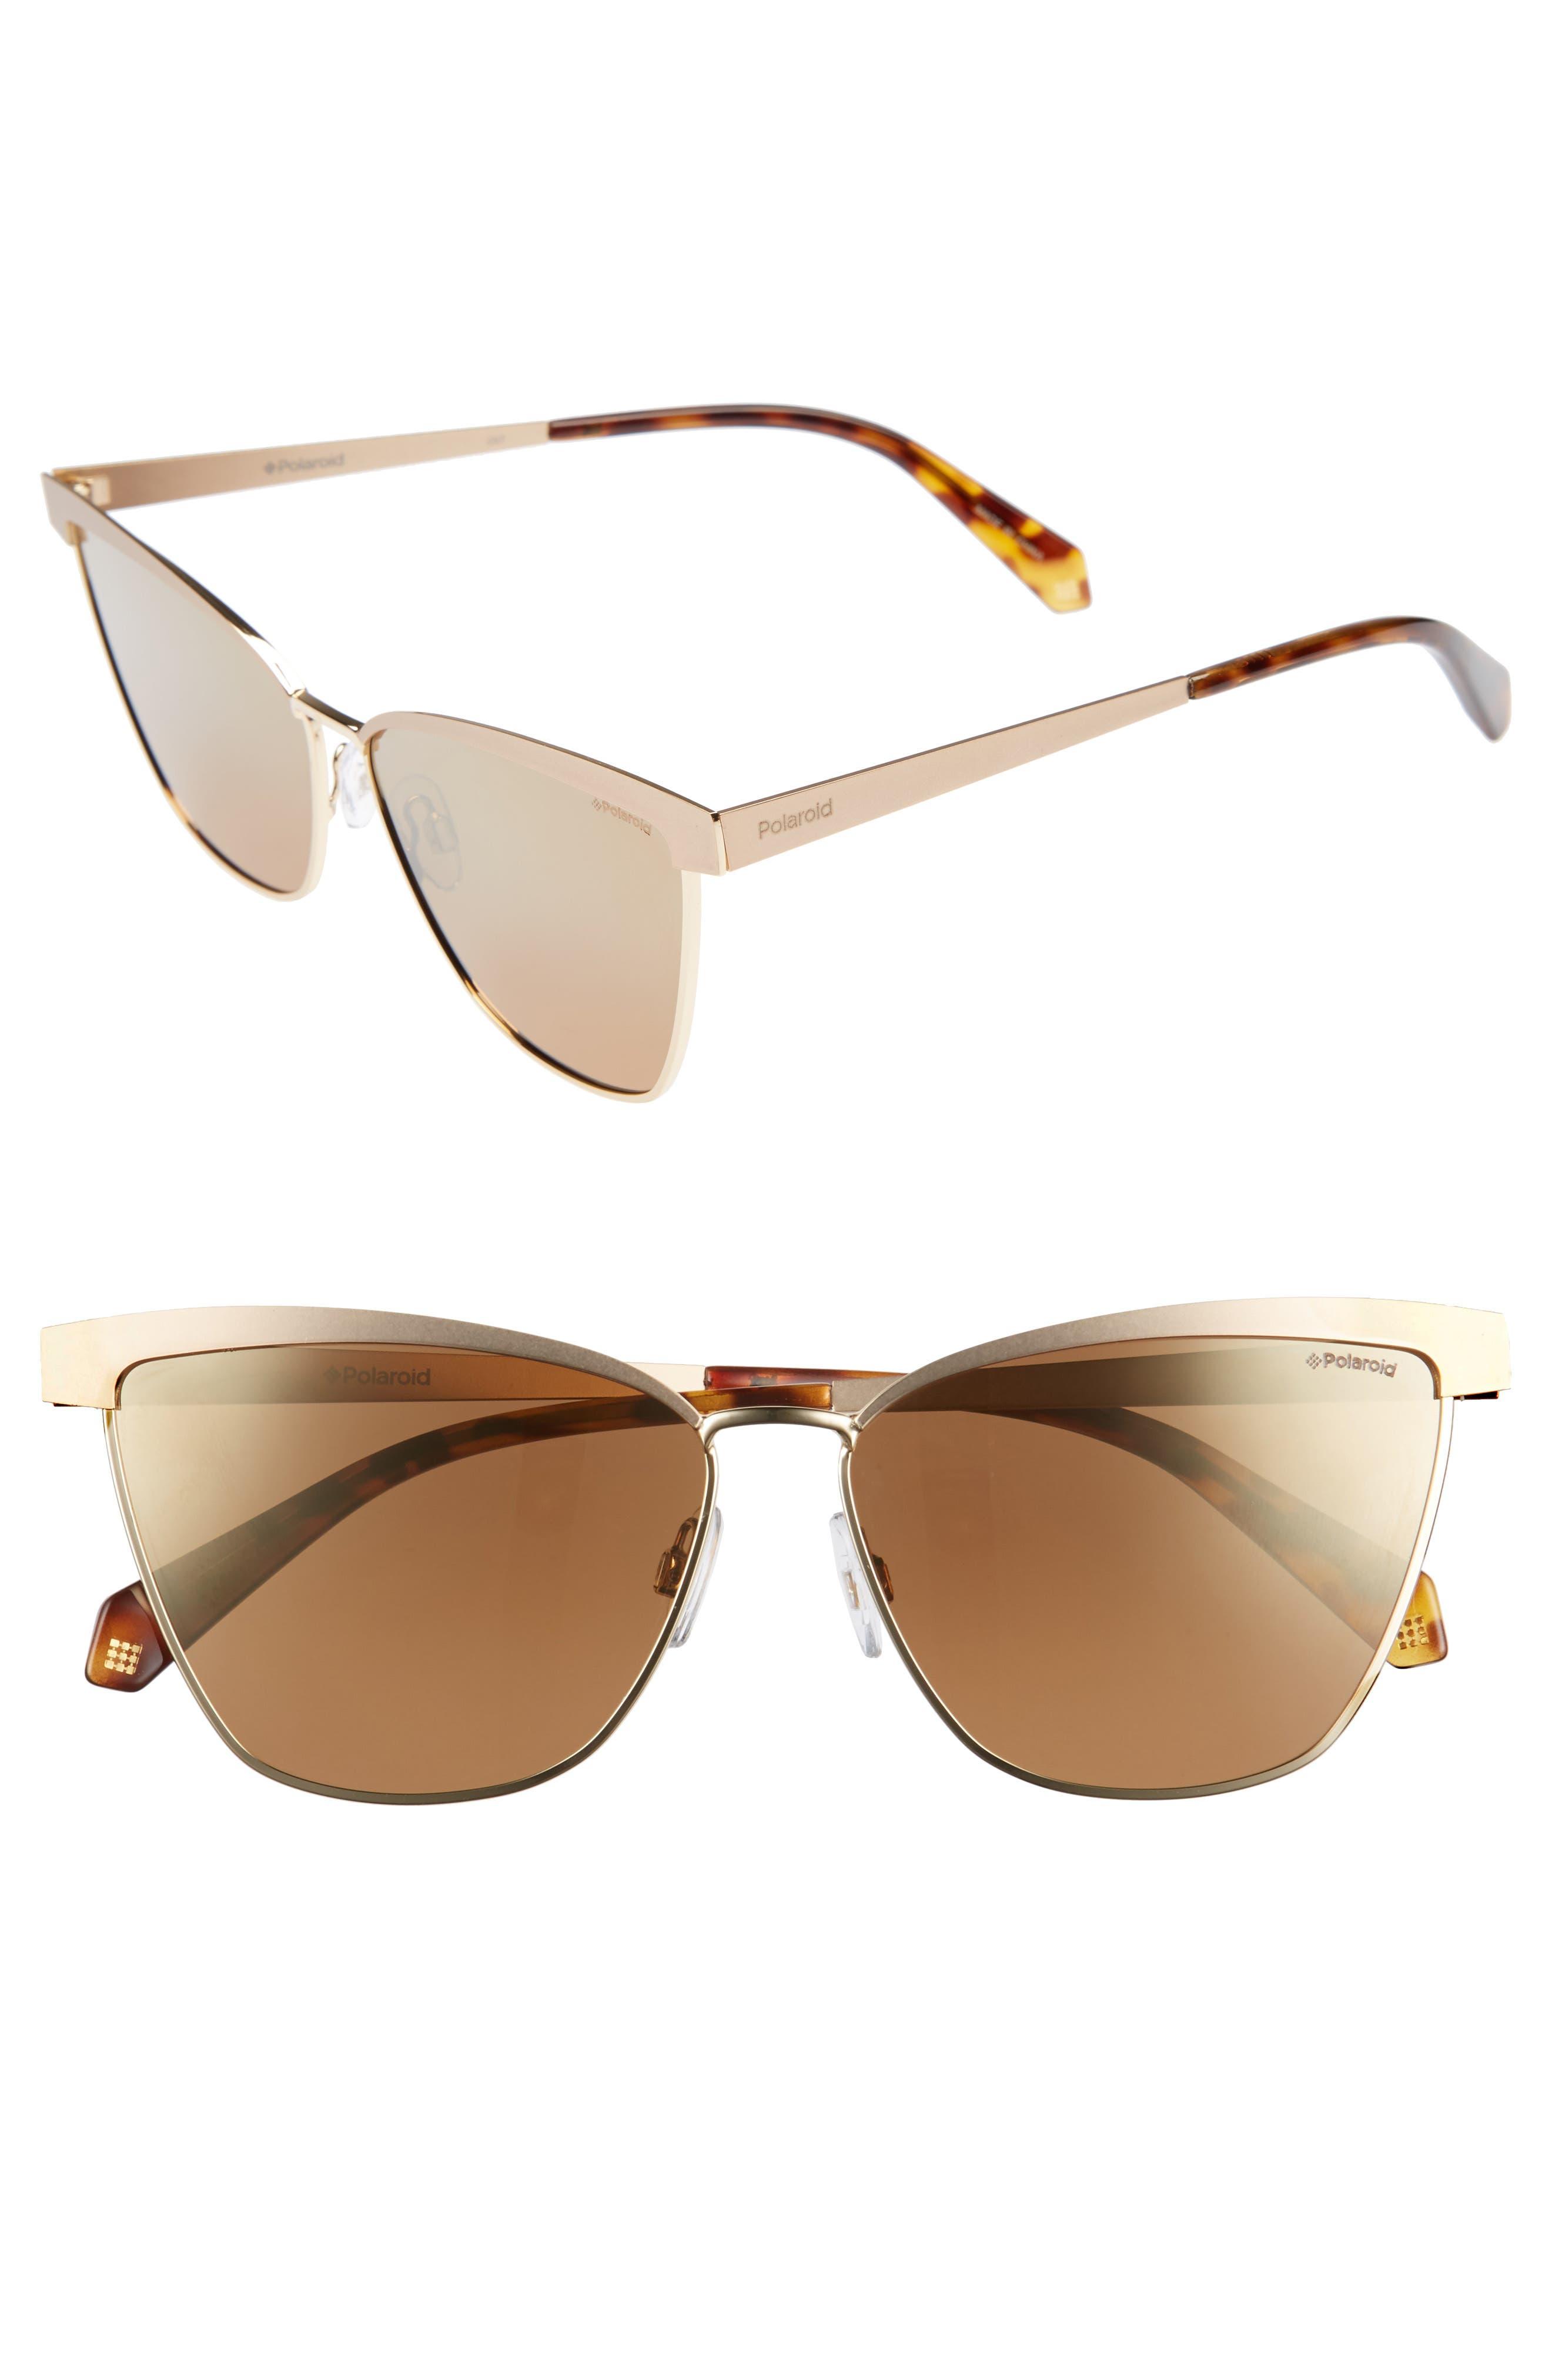 60mm Polarized Cat Eye Sunglasses,                         Main,                         color, Gold